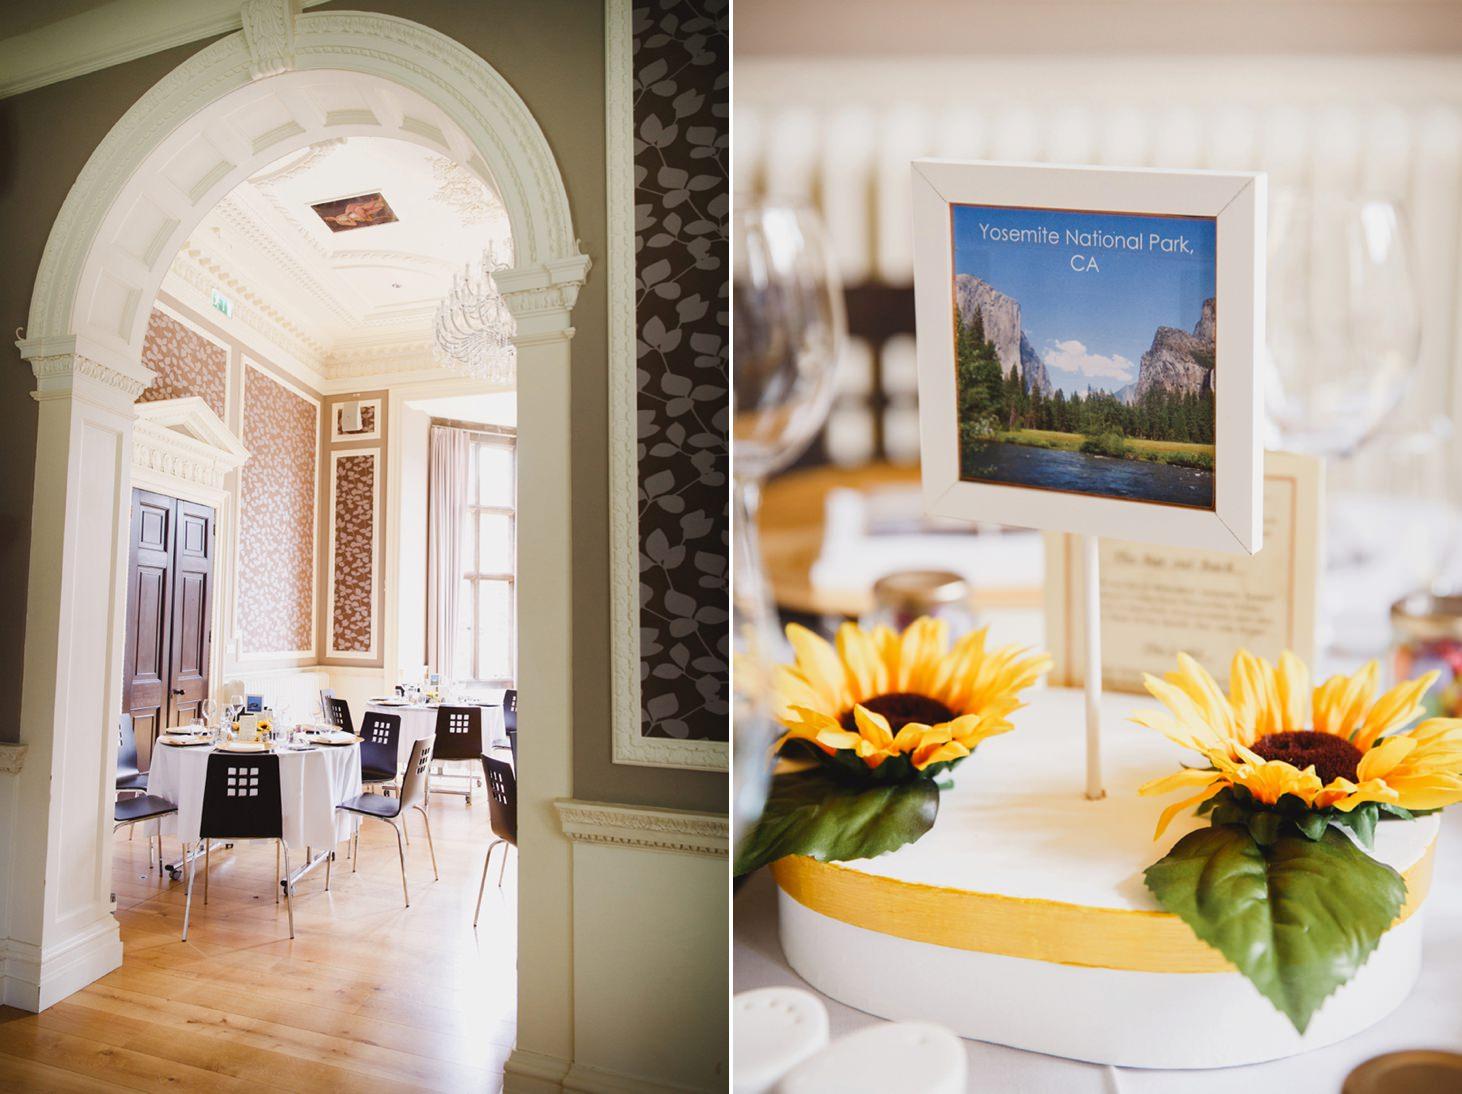 Wycombe Abbey wedding photography wedding breakfast location